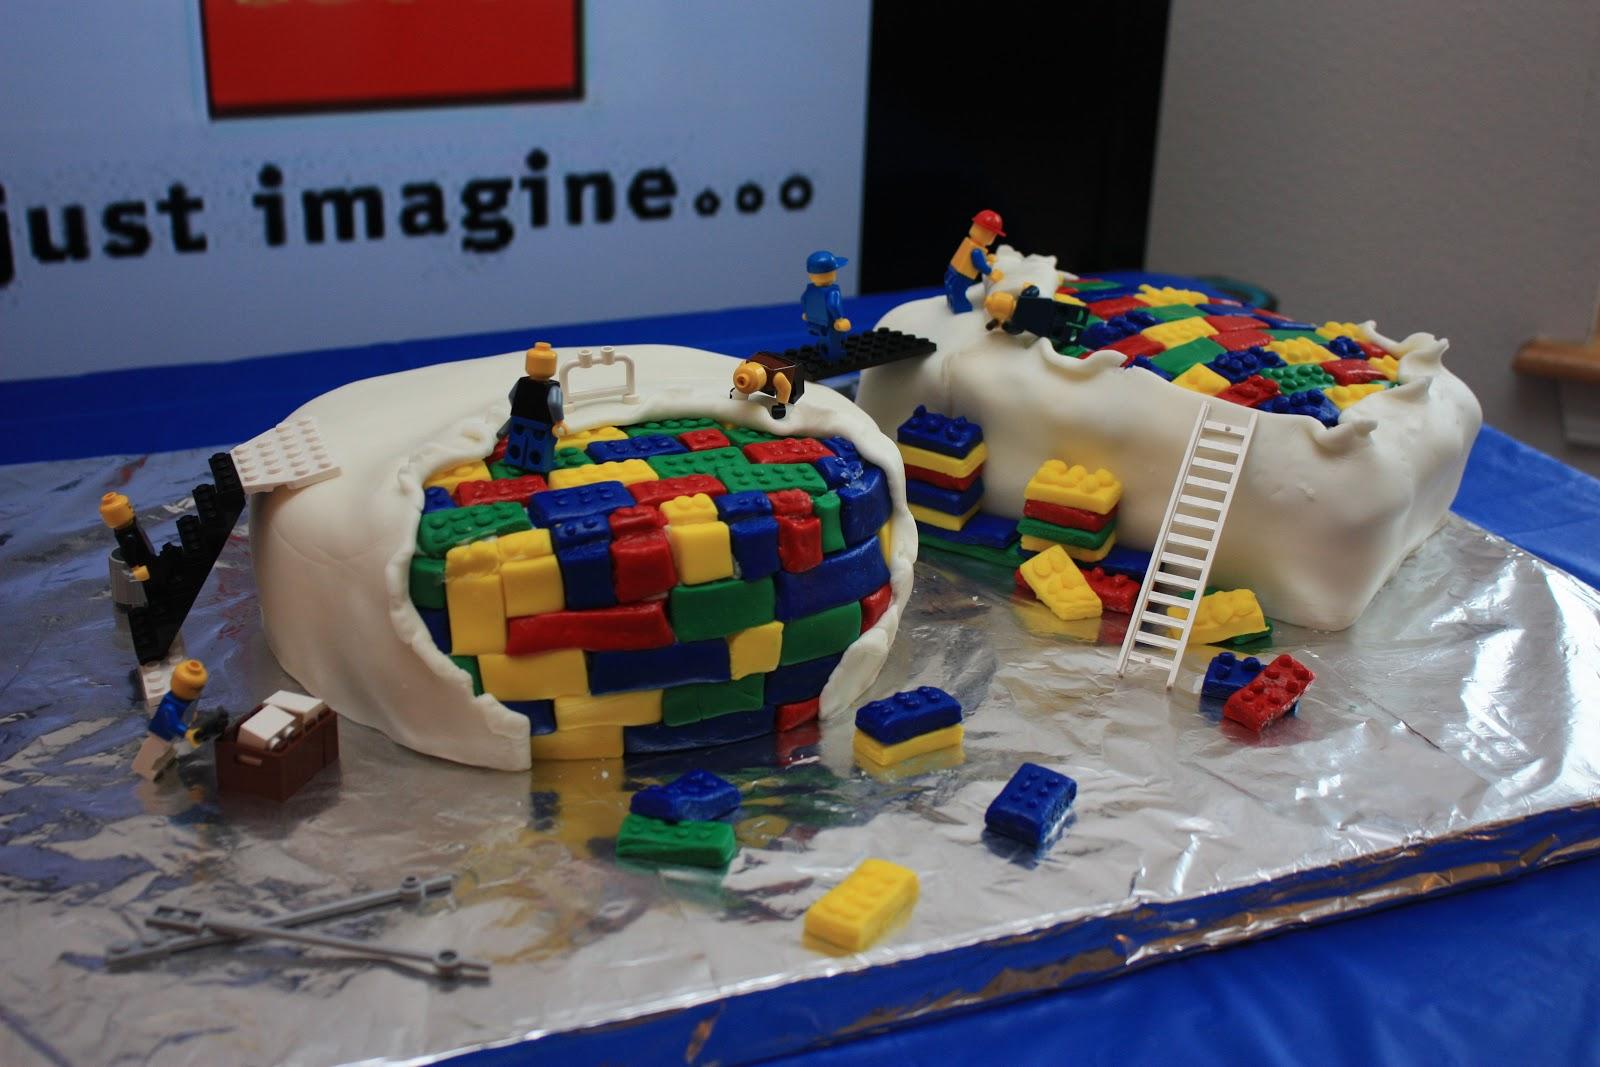 Download 8 Year Old Birthday Cakes For Boys Birthday Cakes 8 Boy 1600x1067 Wallpaper Teahub Io